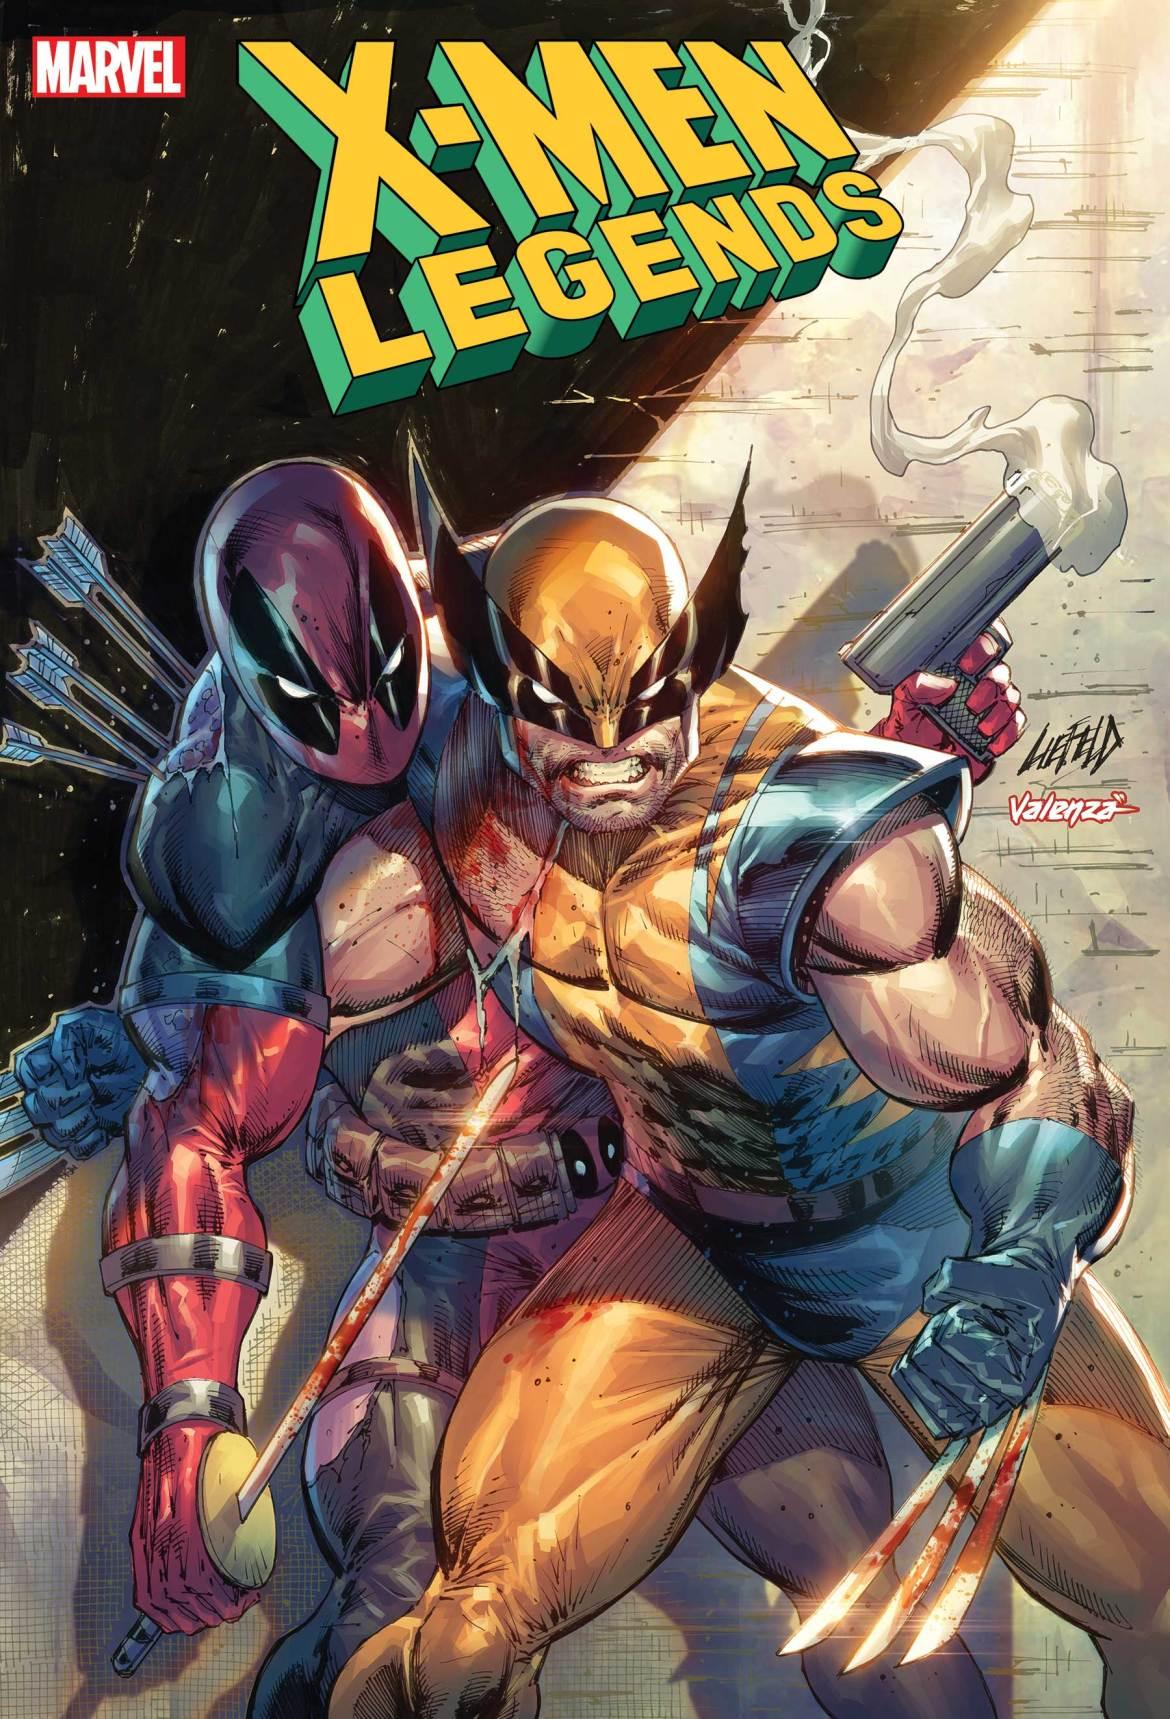 XMLEGENDS2021004_Liefeld_VAR Marvel Comics May 2021 Solicitations